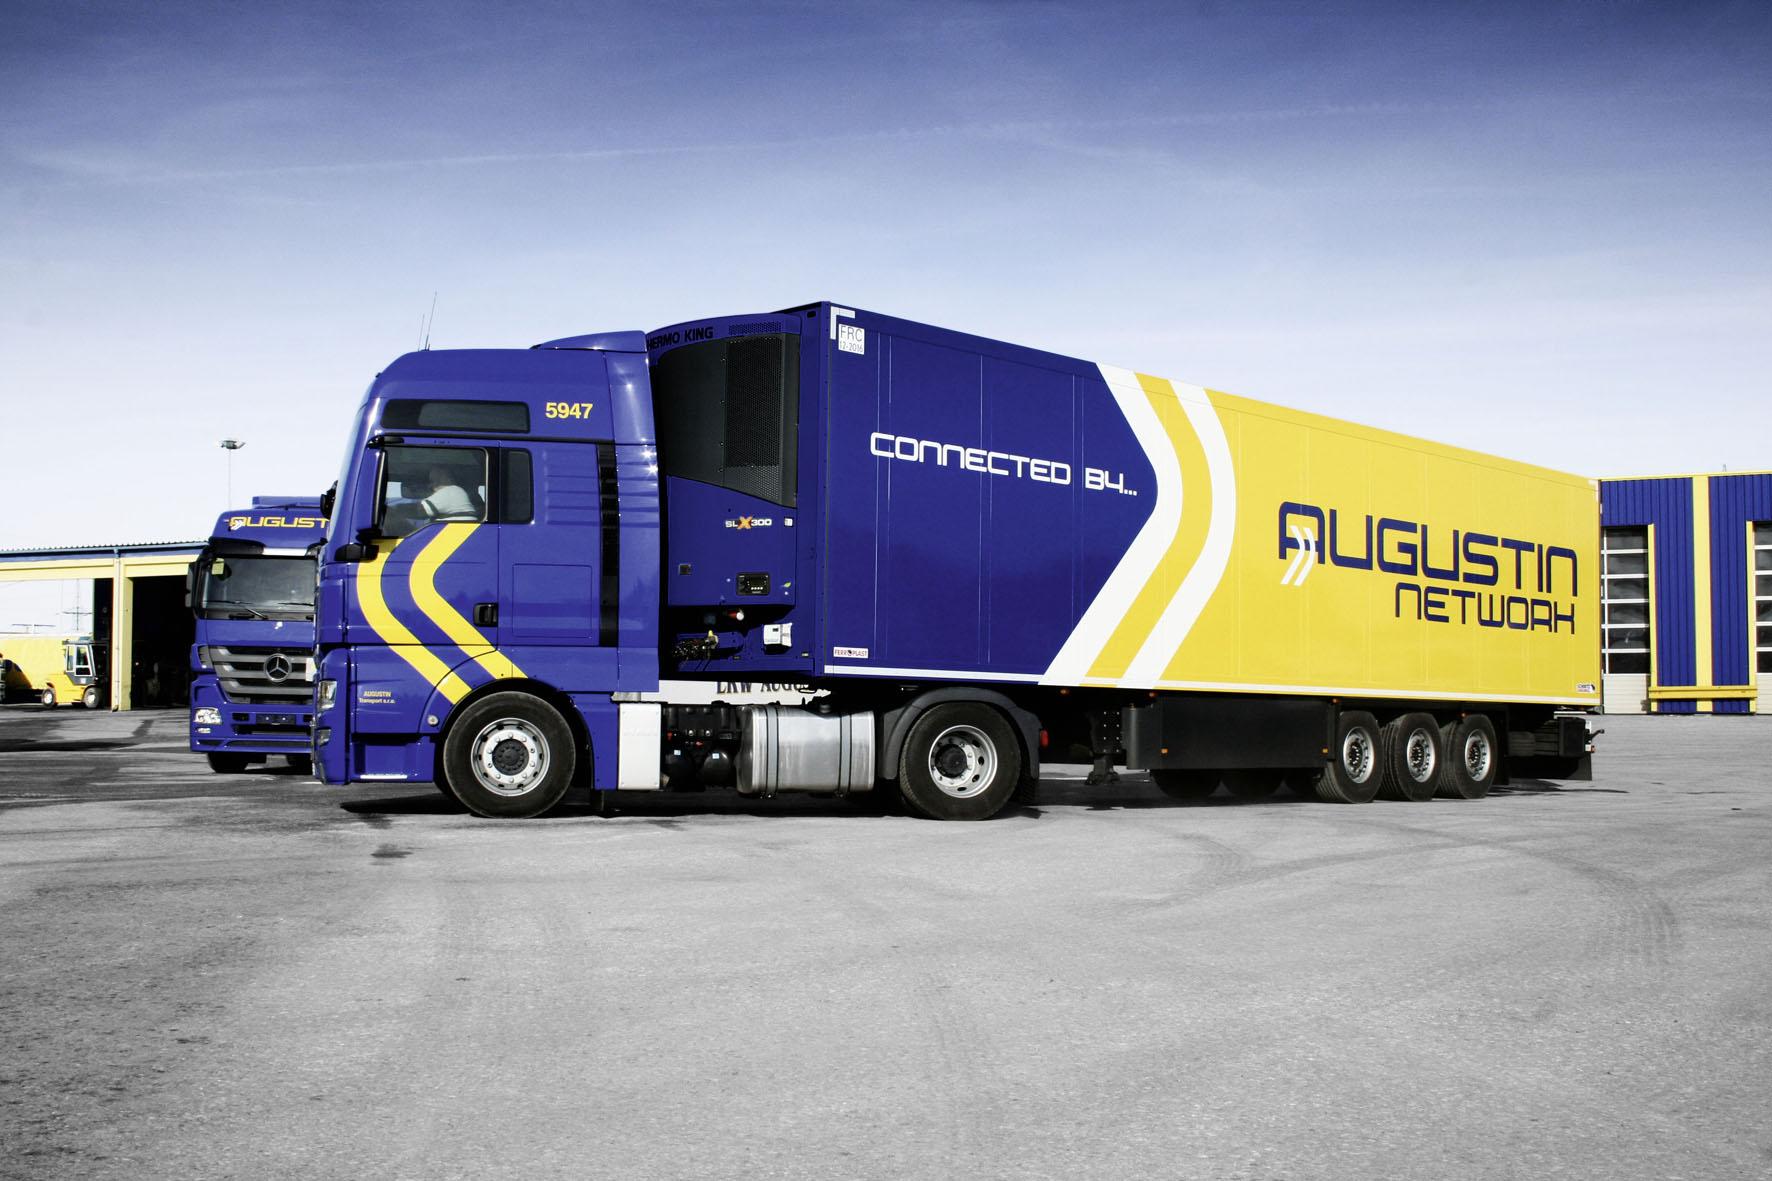 Transportation Company - Augustin Network - Logistics